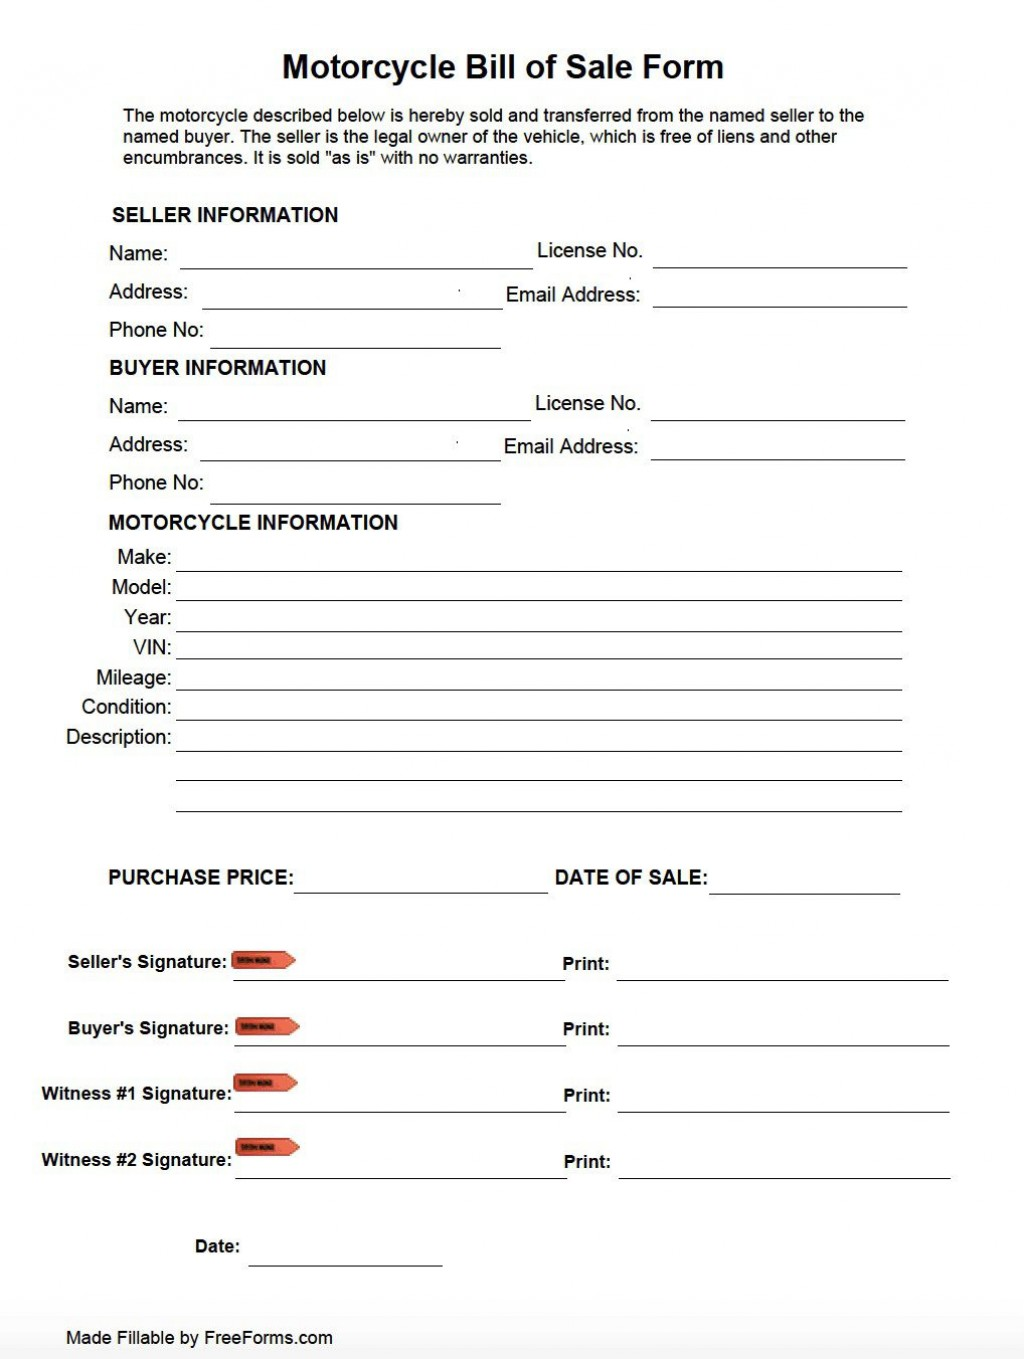 006 Incredible Motorcycle Bill Of Sale Template Image  Ontario Printable Word CaliforniaLarge